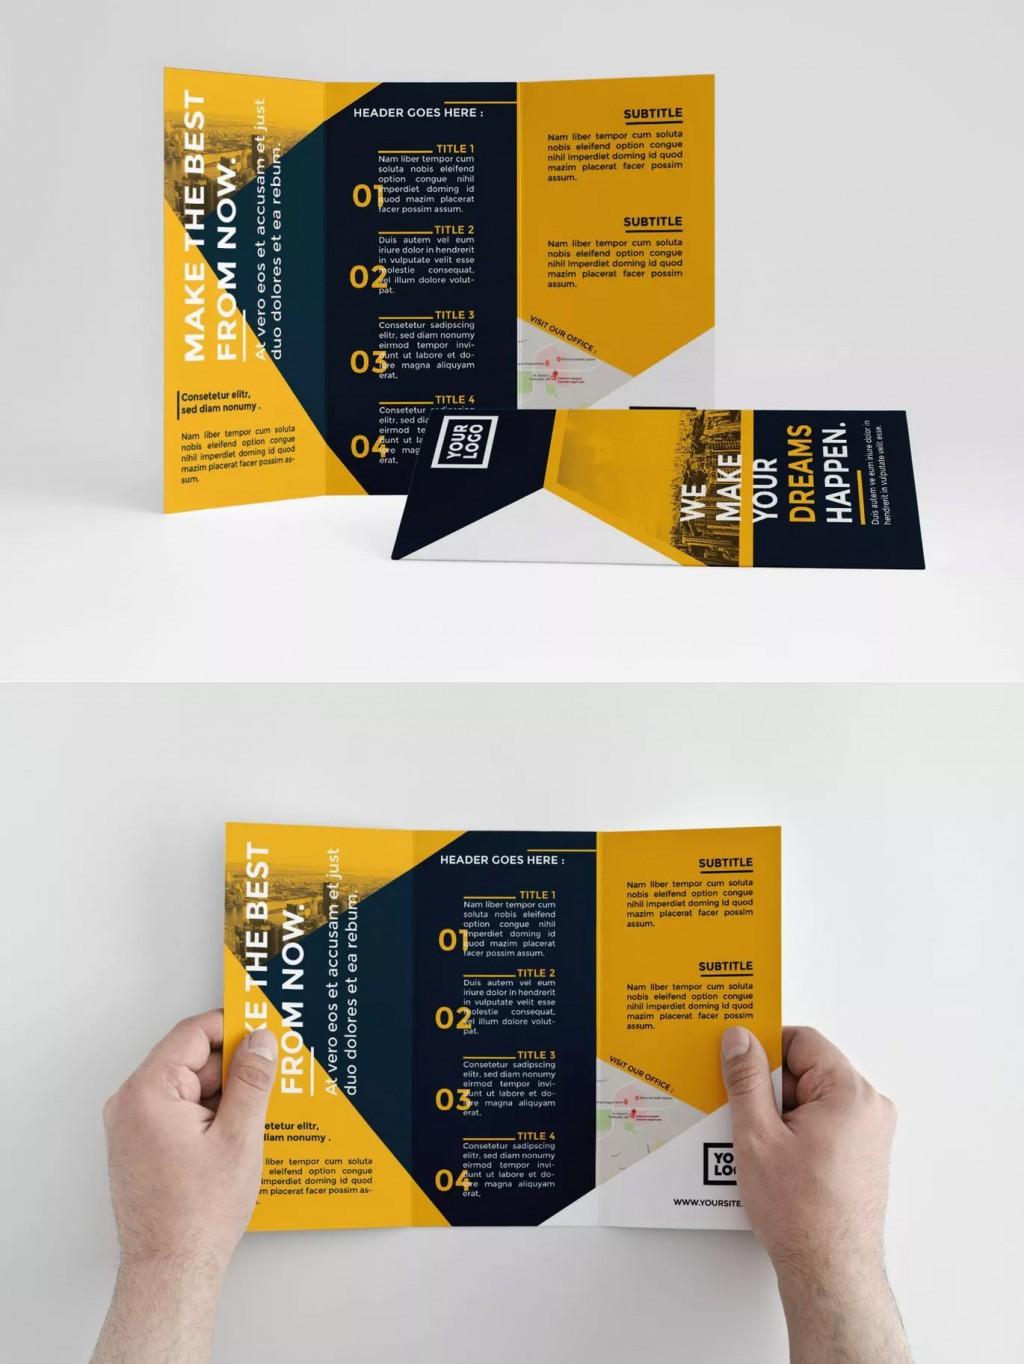 000 Shocking Indesign Trifold Brochure Template Inspiration  Tri Fold A4 Bi Free DownloadLarge